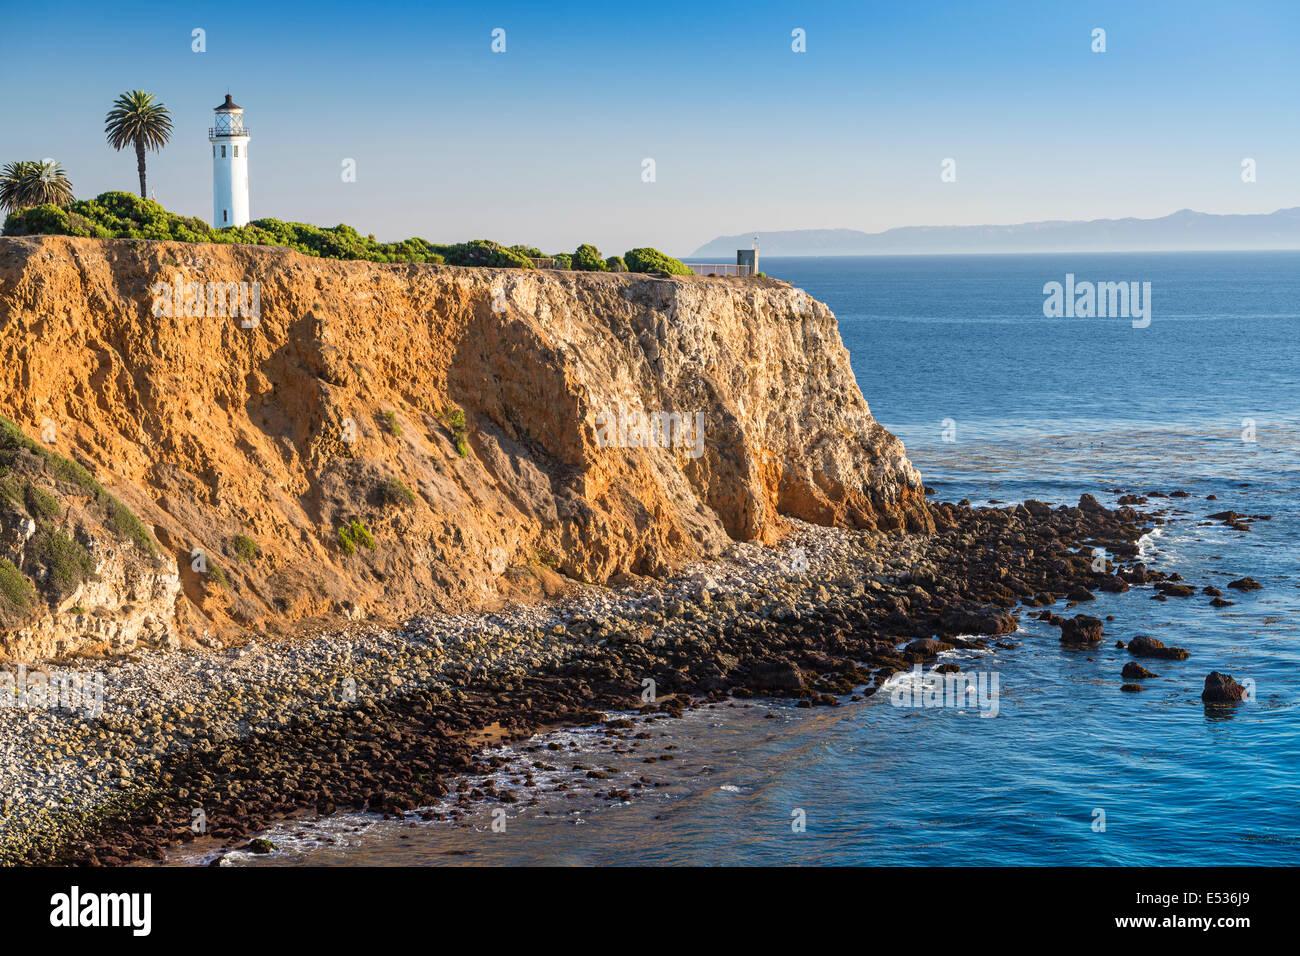 Los Angeles, Kalifornien, USA Point Vicente Leuchtturm in Rancho Palos Verdes. Stockbild